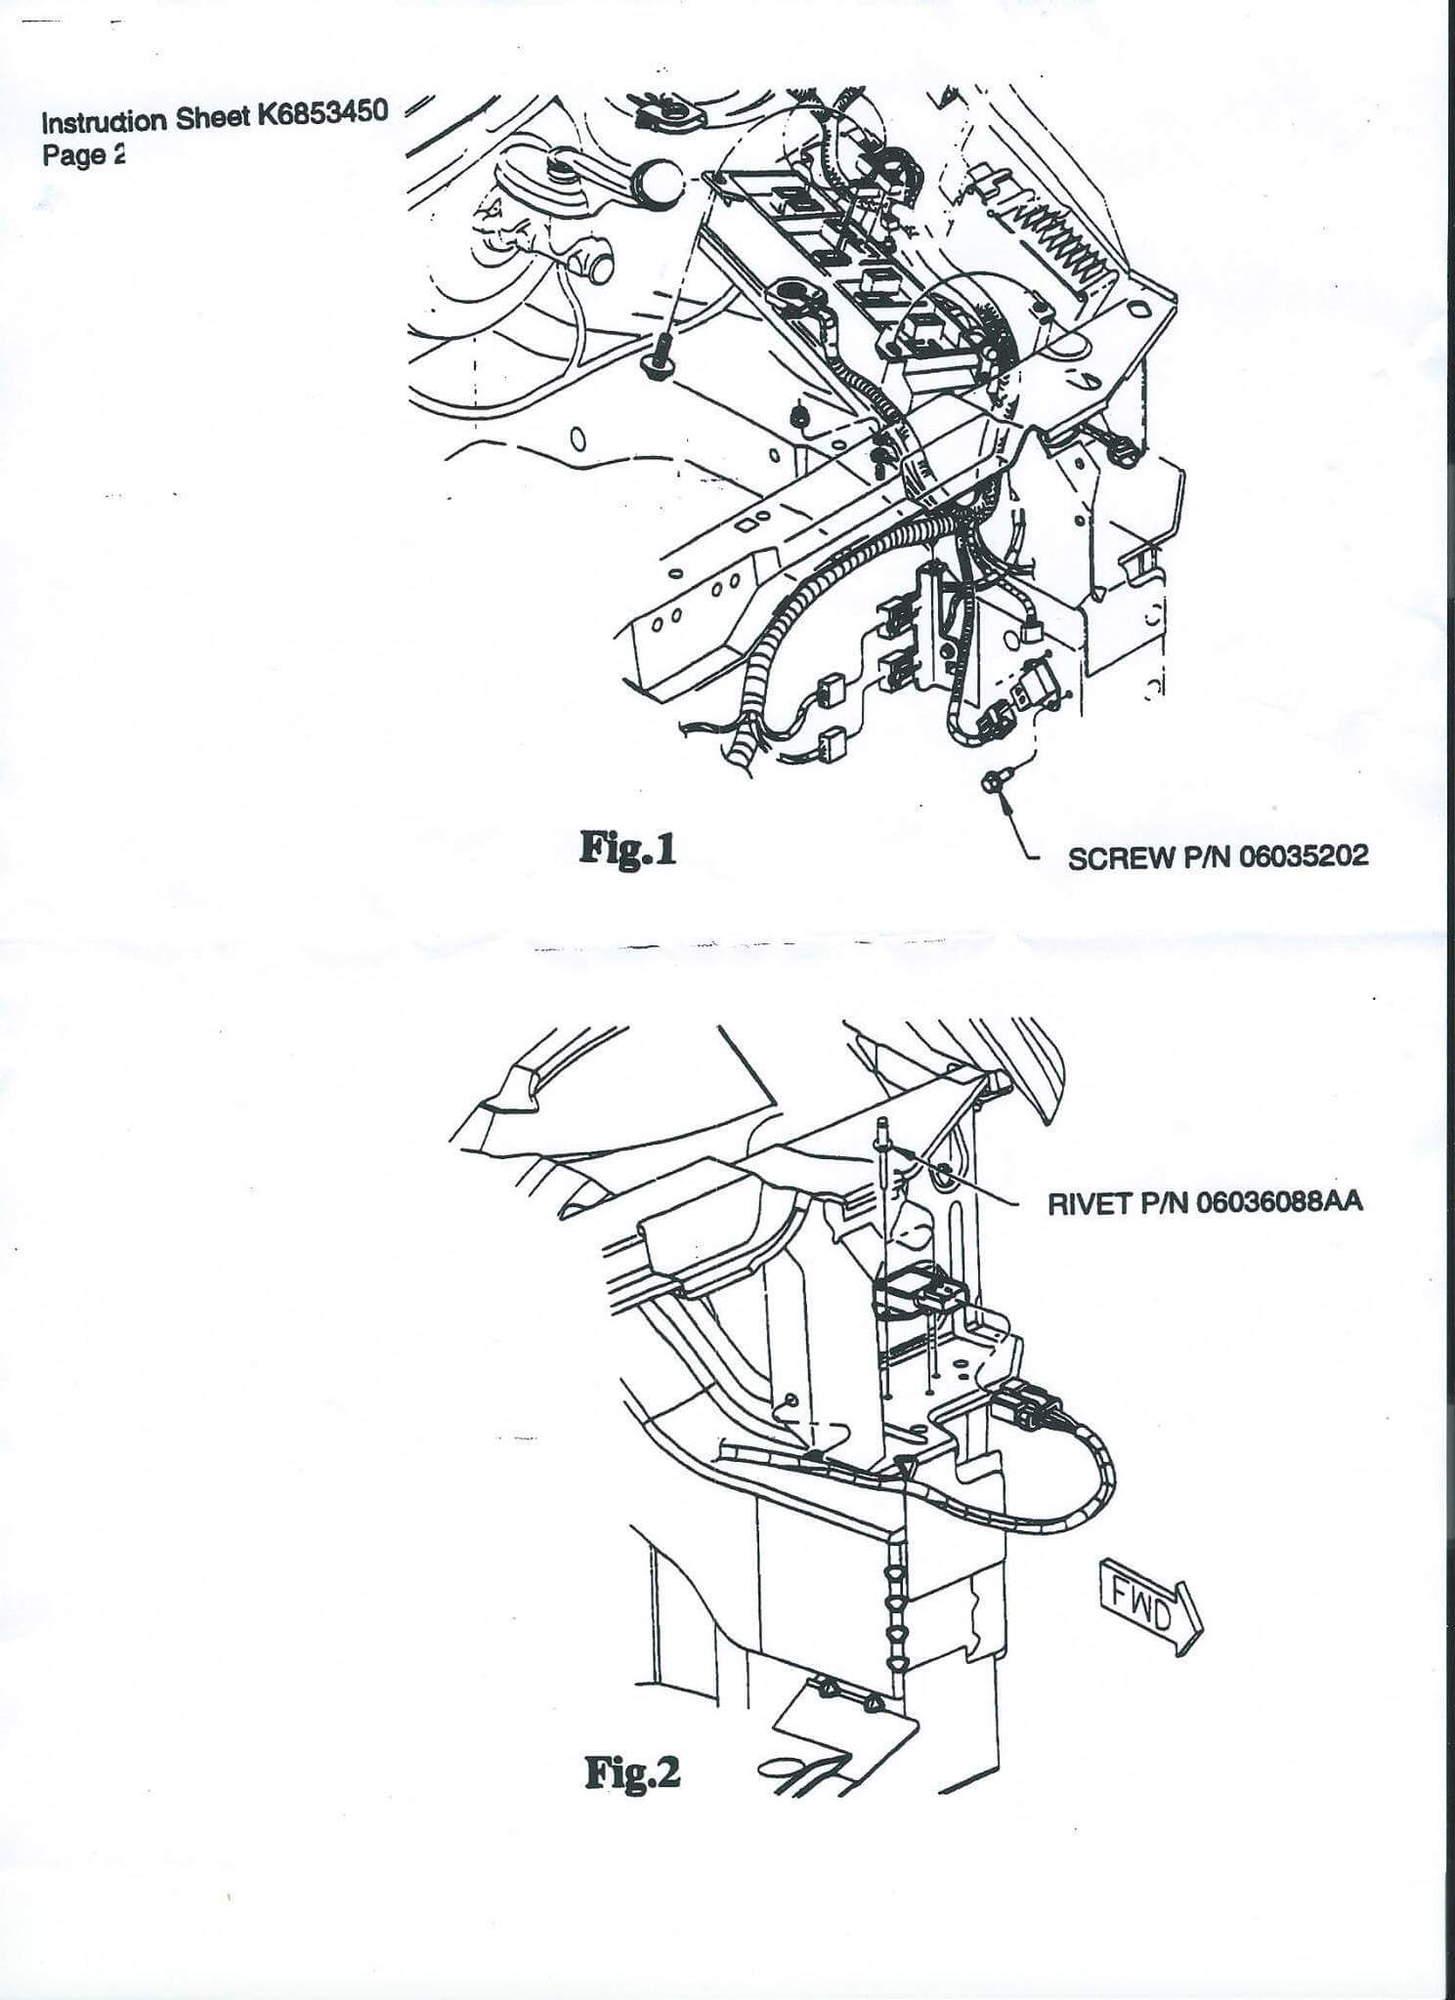 Radiator Fan Control Relay